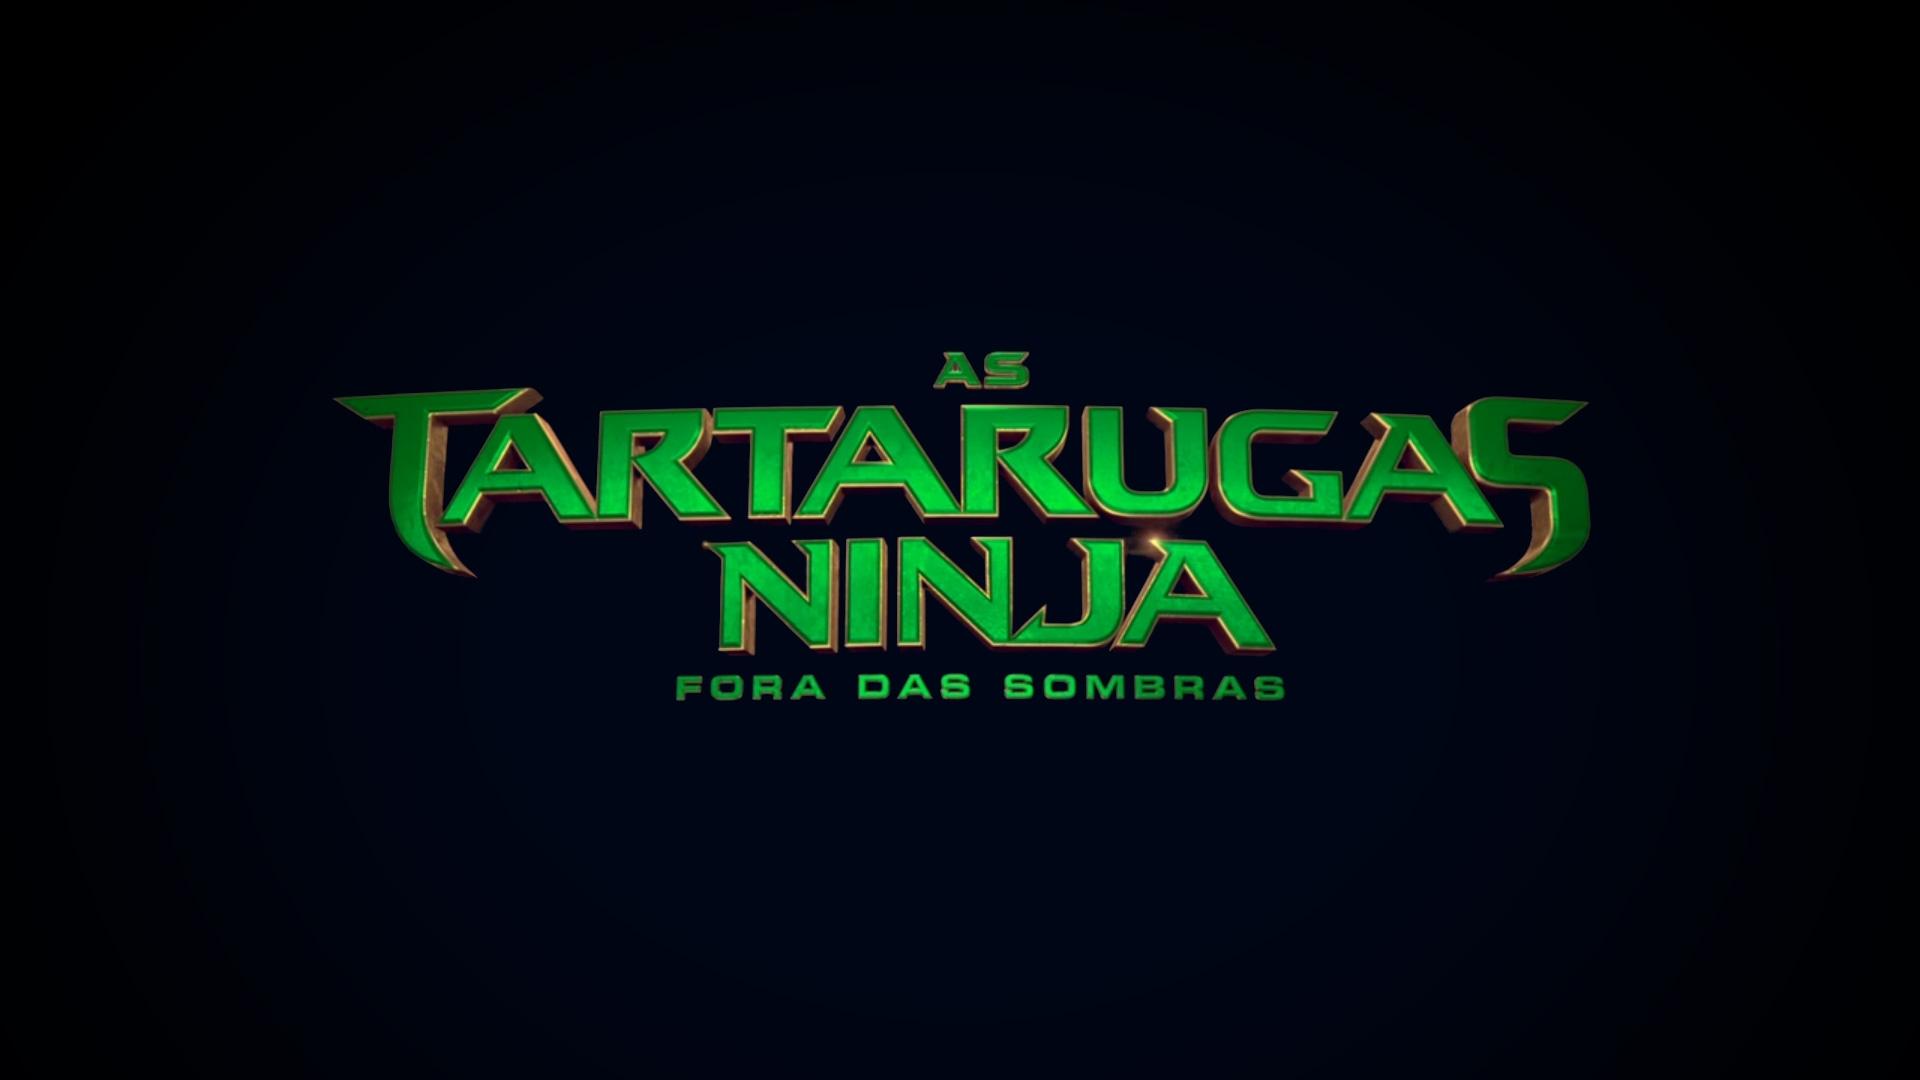 Populares Crítica: As Tartarugas Ninja - Fora das Sombras QW88